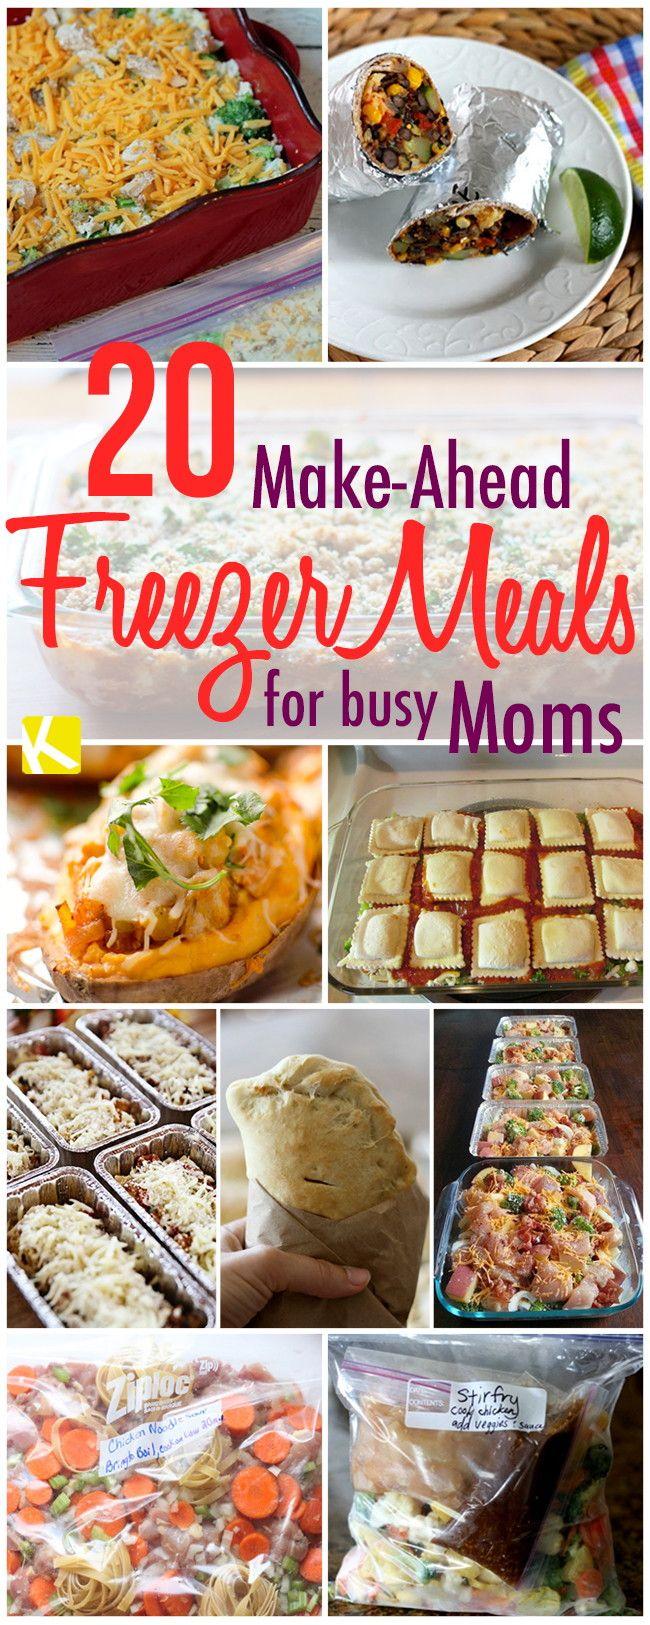 20 make ahead freezer dinners for busy moms meal prep ideas abendessen einfrieren leckeres. Black Bedroom Furniture Sets. Home Design Ideas